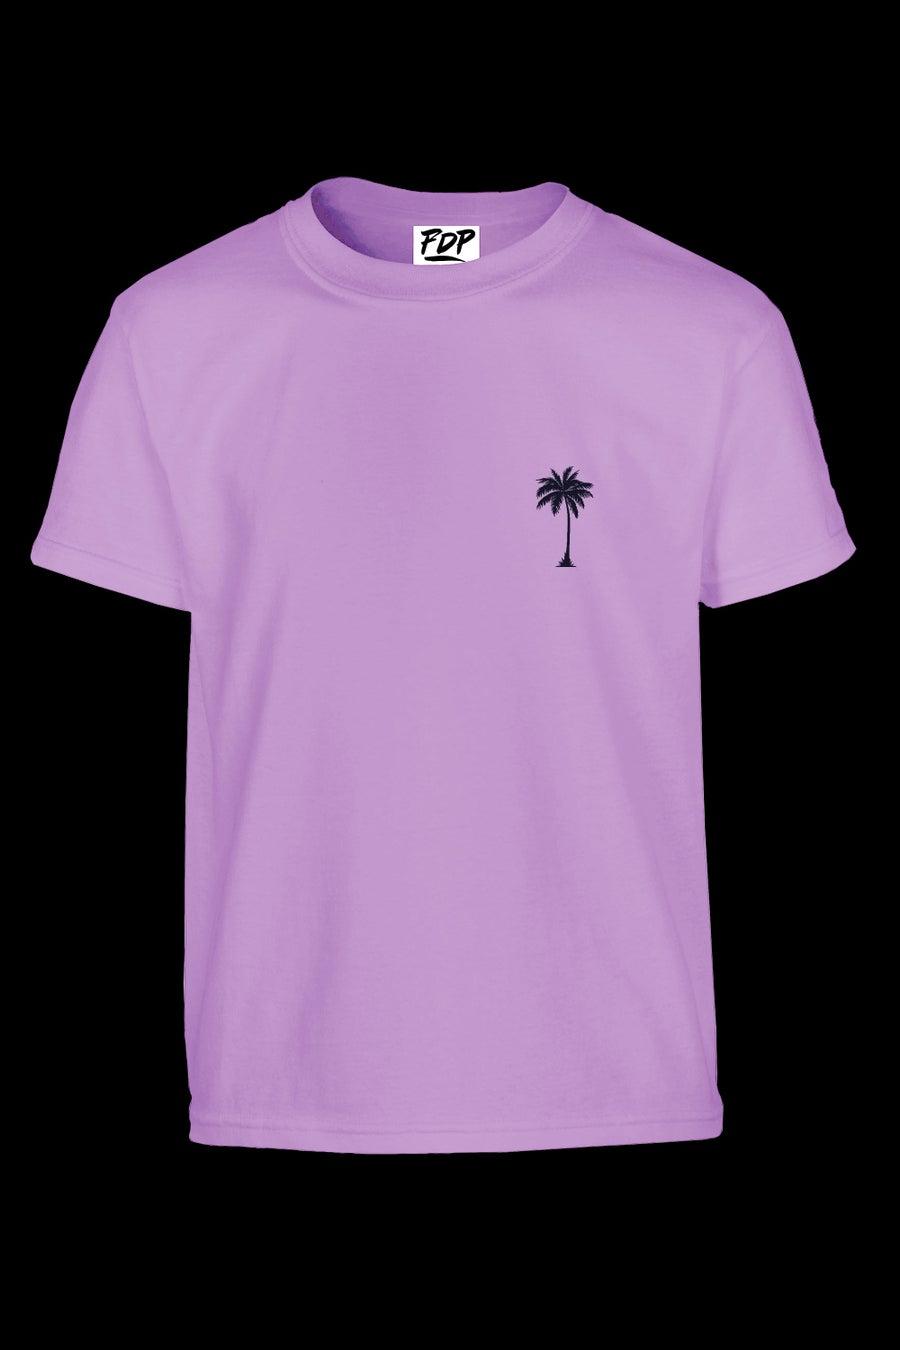 Image of FDP Tshirt Pink Unisex